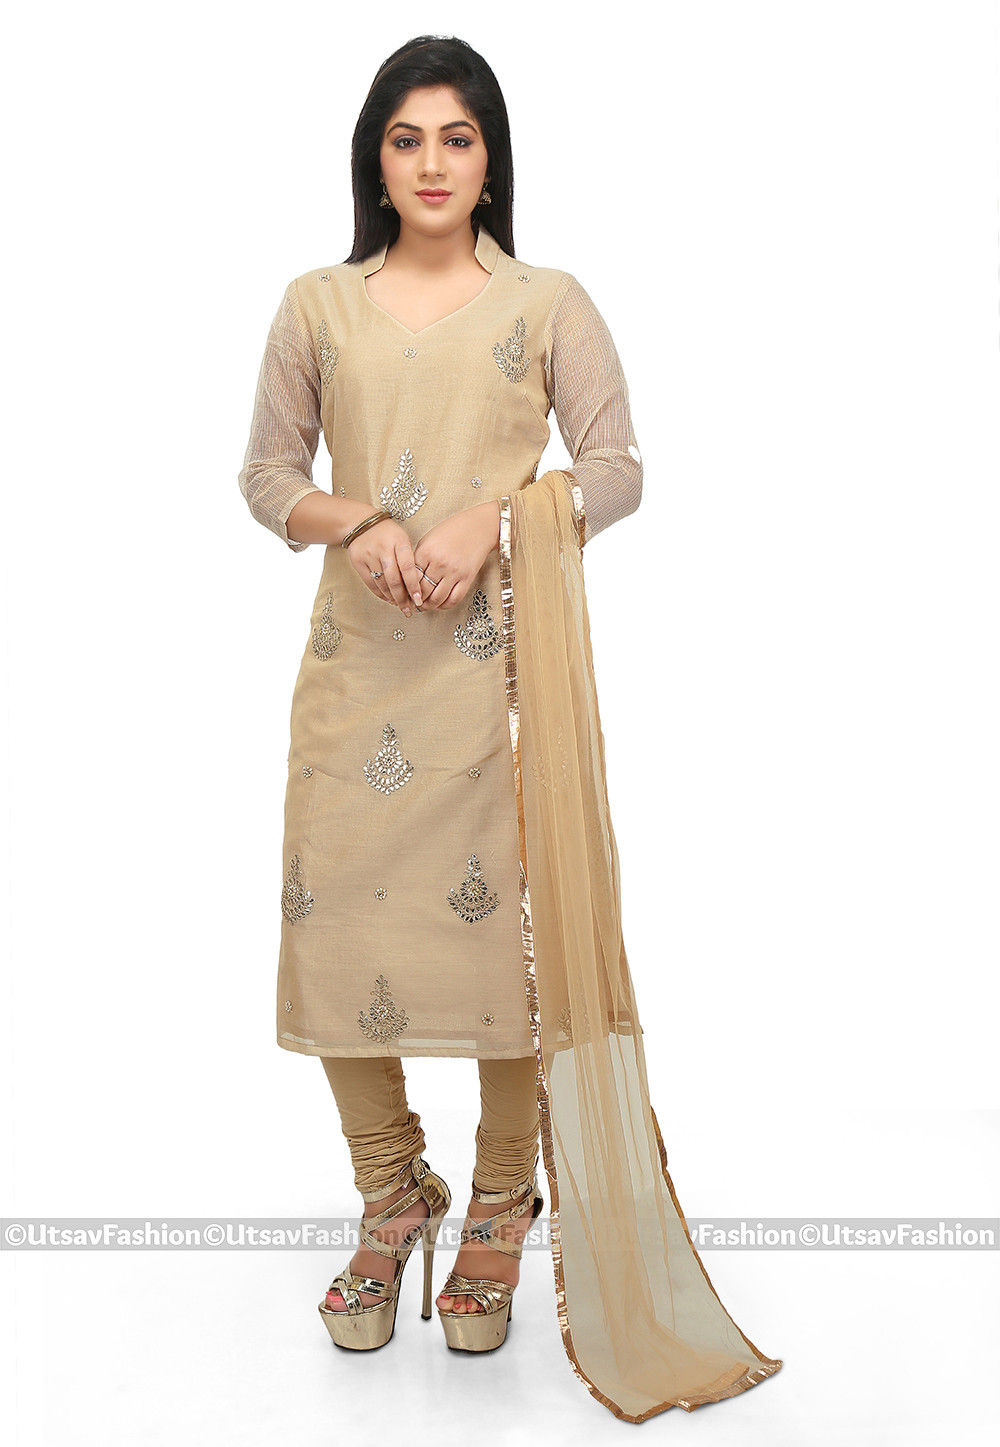 Utsav fashion shopping bag - Embroidered Chanderi Cotton Straight Suit In Beige